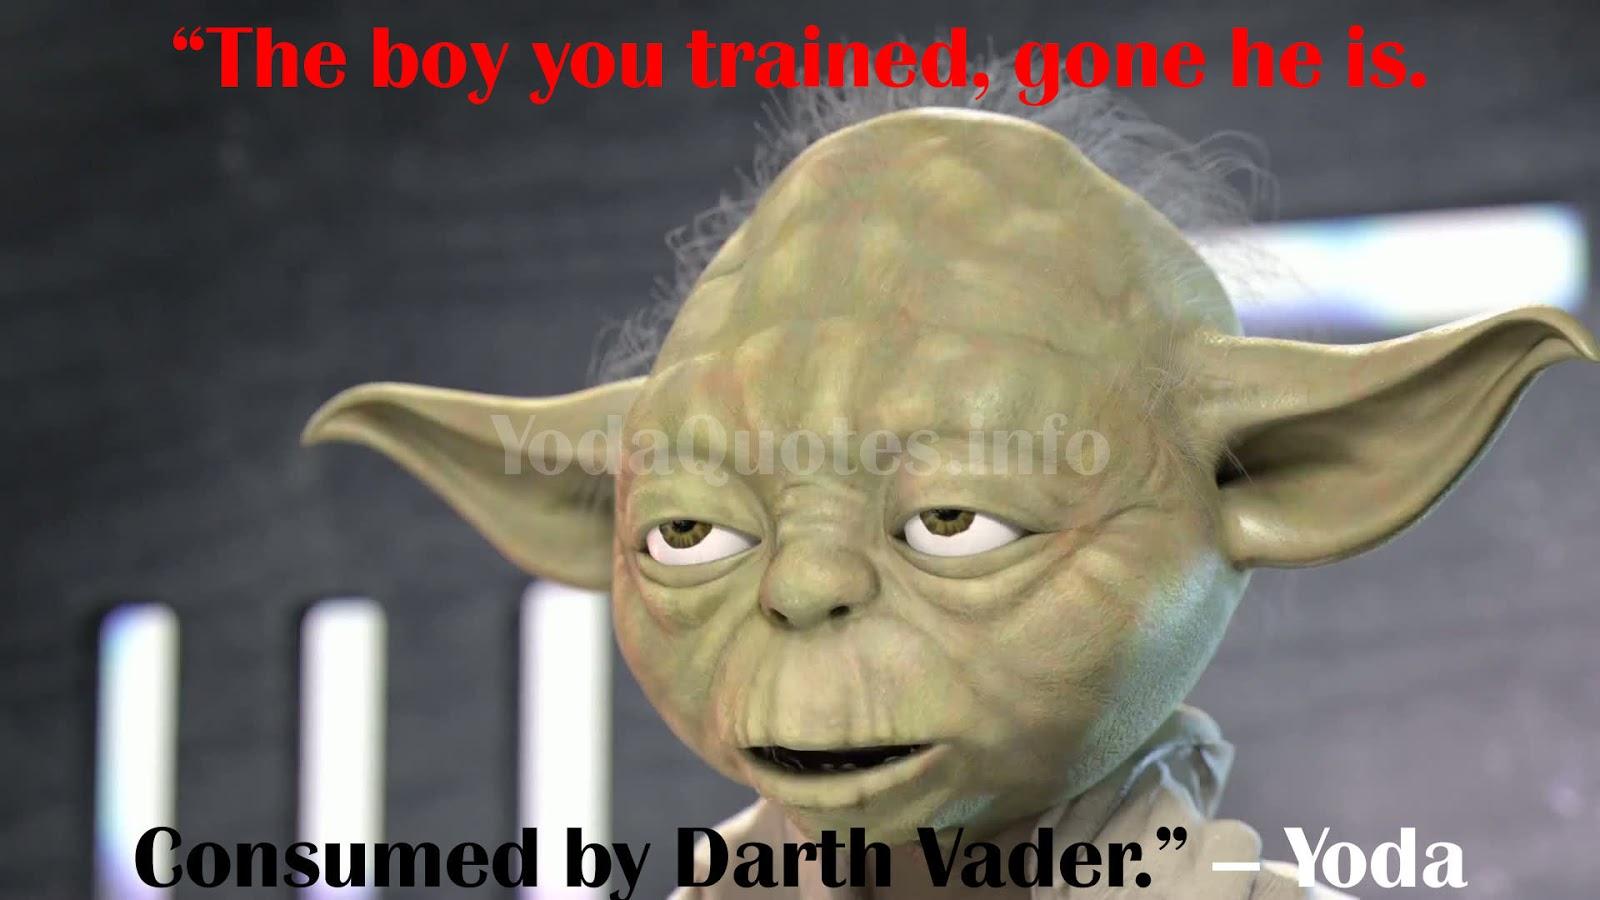 Famous Yoda Quotes Yoda Quotes Youtube , Yoda Quotes Patience | Famous Yoda Quotes  Famous Yoda Quotes